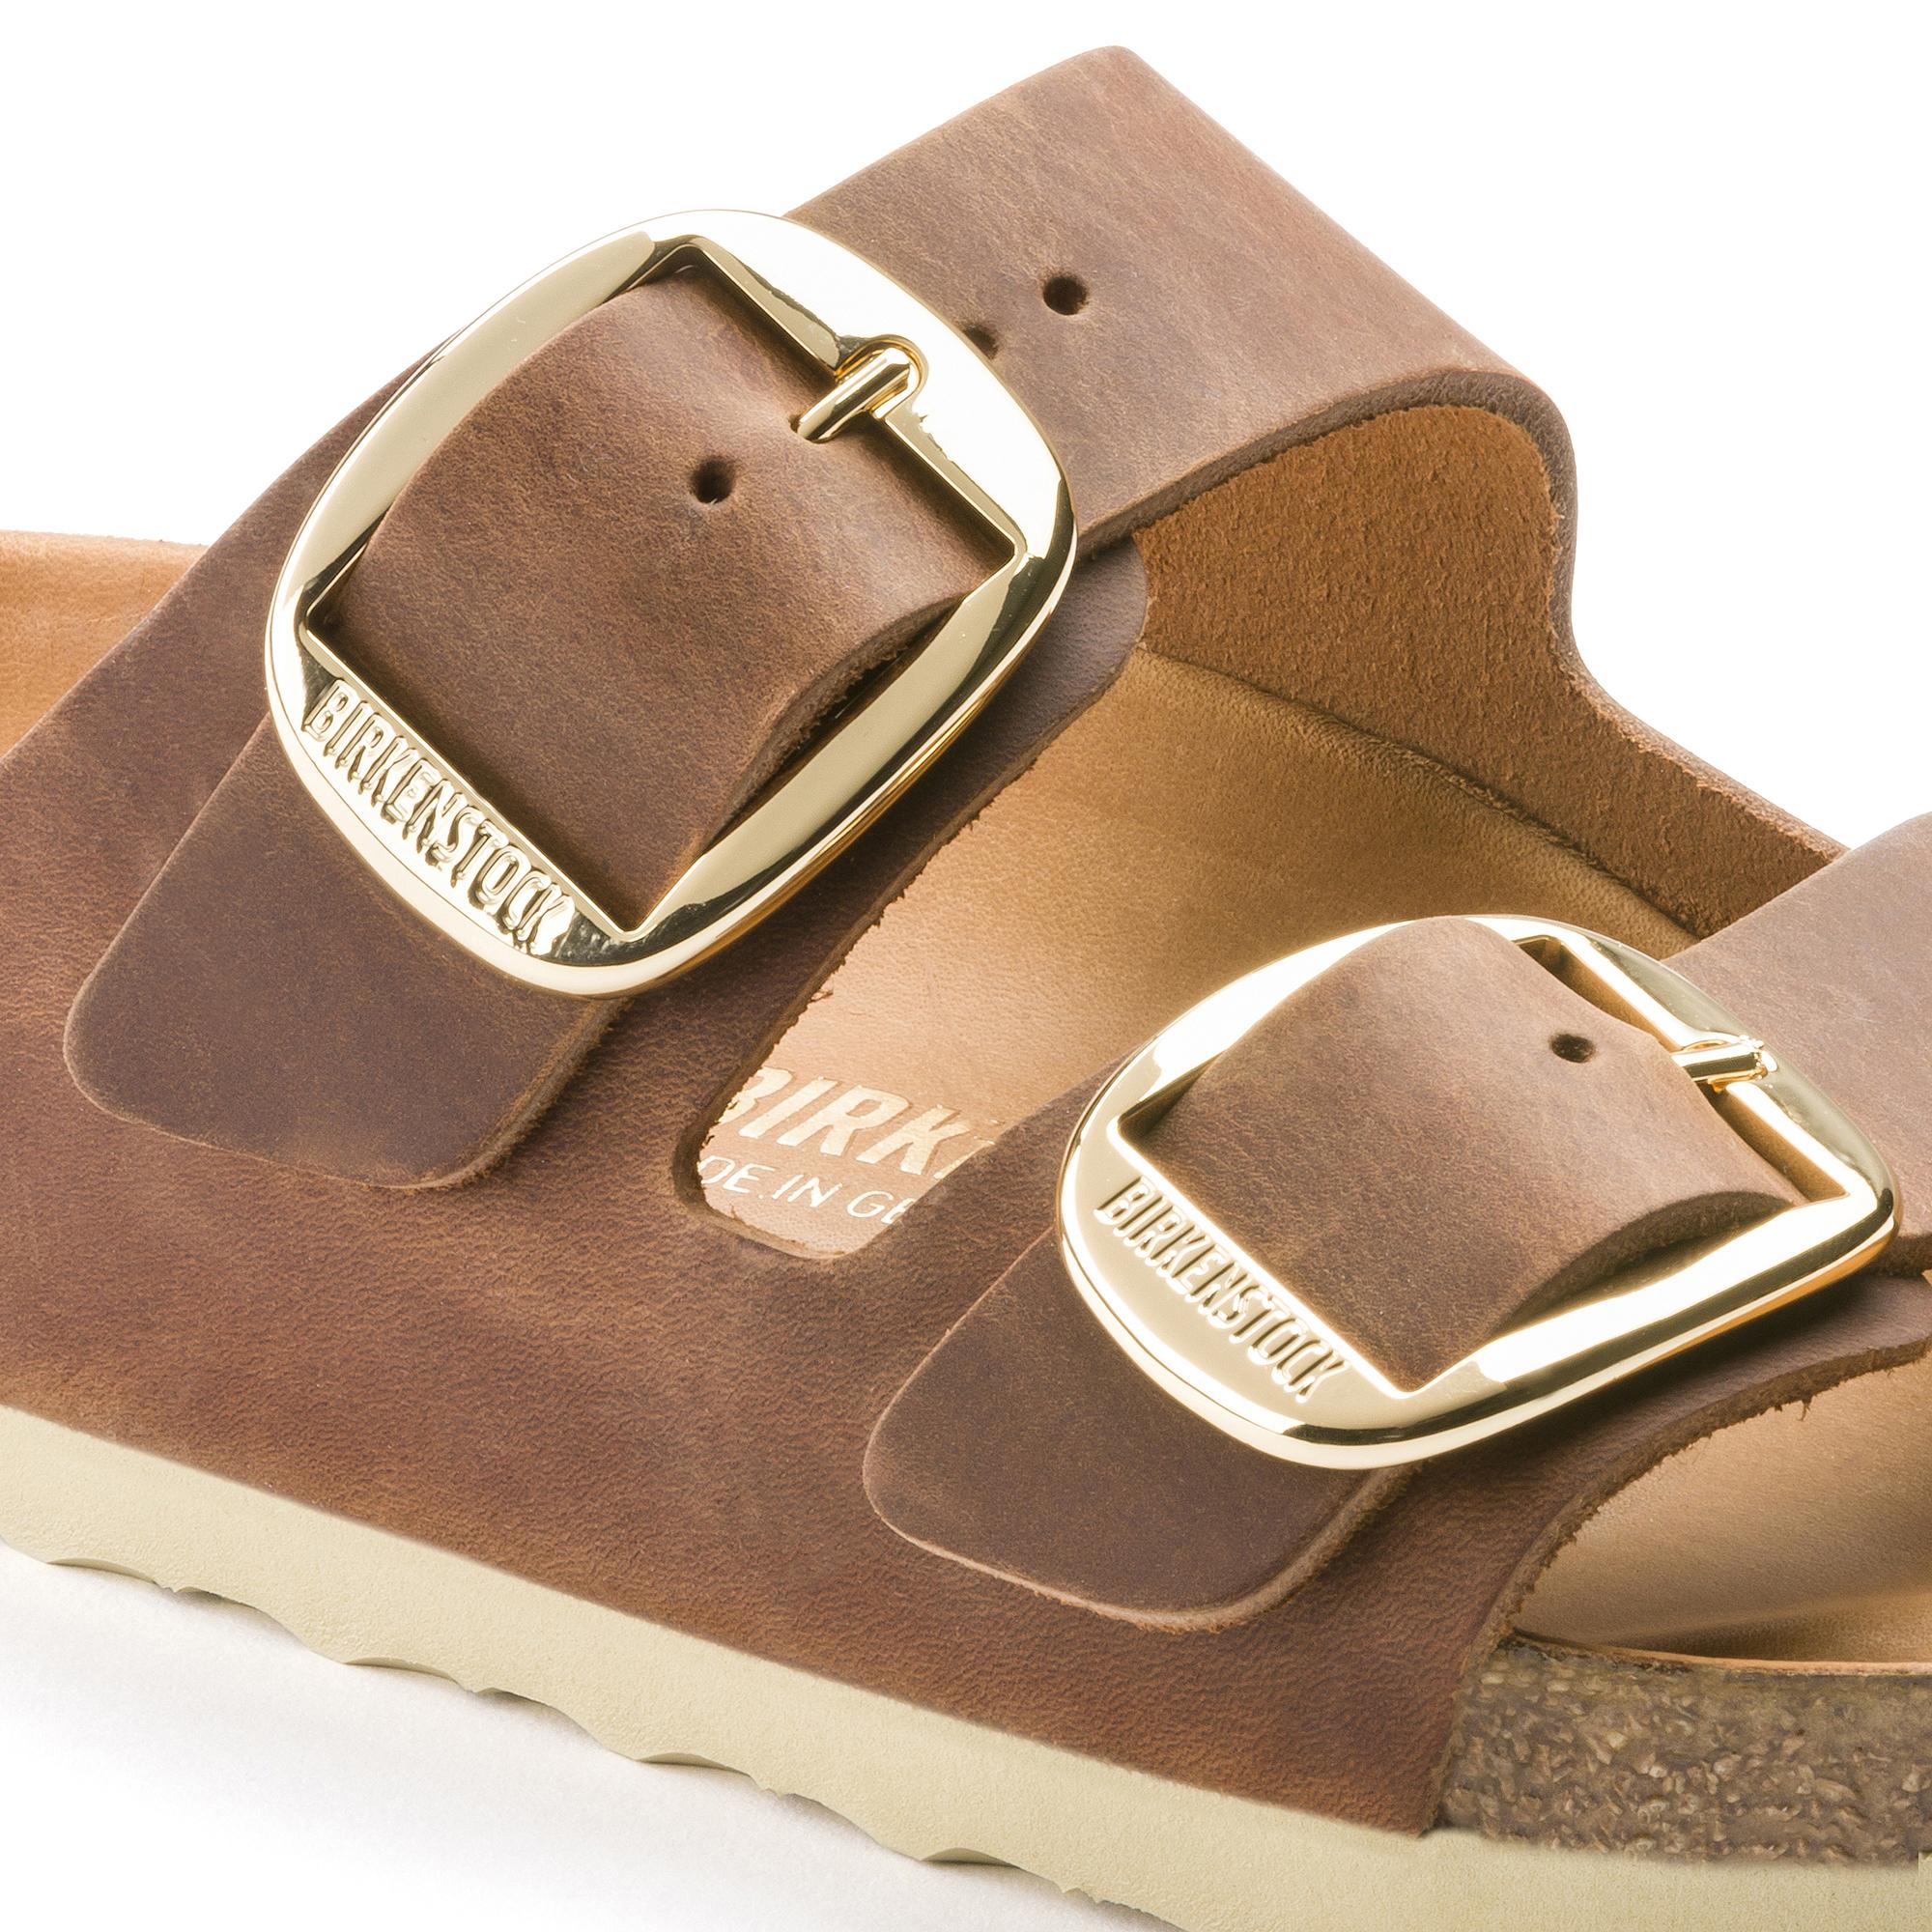 Details about Birkenstock Sandals ARIZONA BIG BUCKLE antique brown (cognac) leather regular